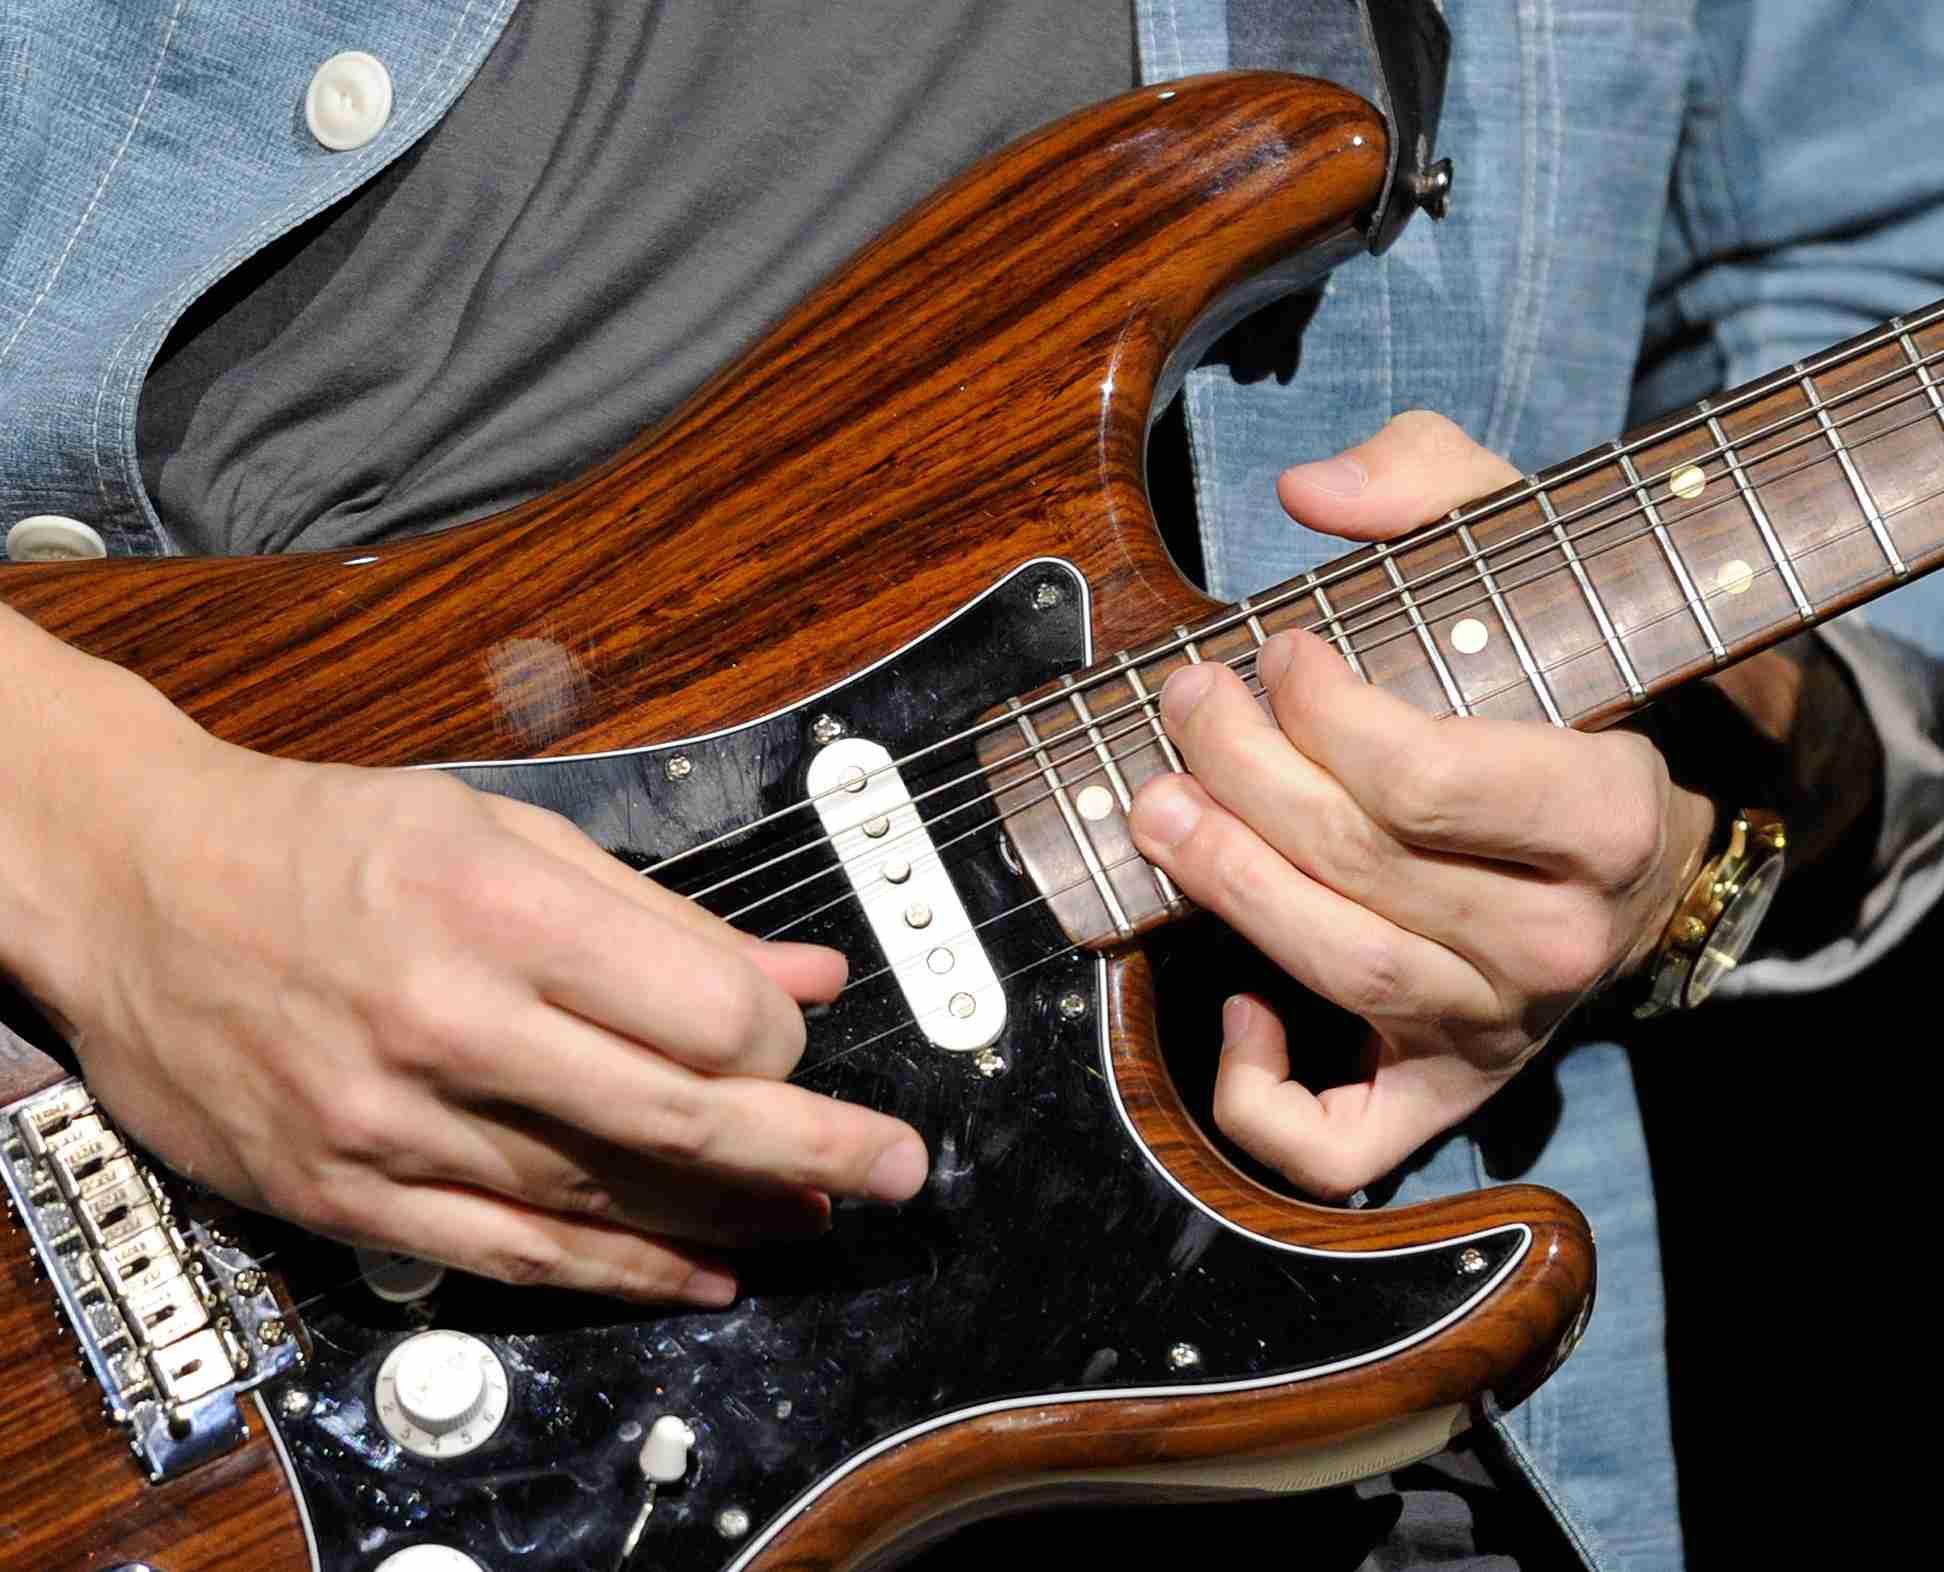 guitar-close-up-string-bend.jpg